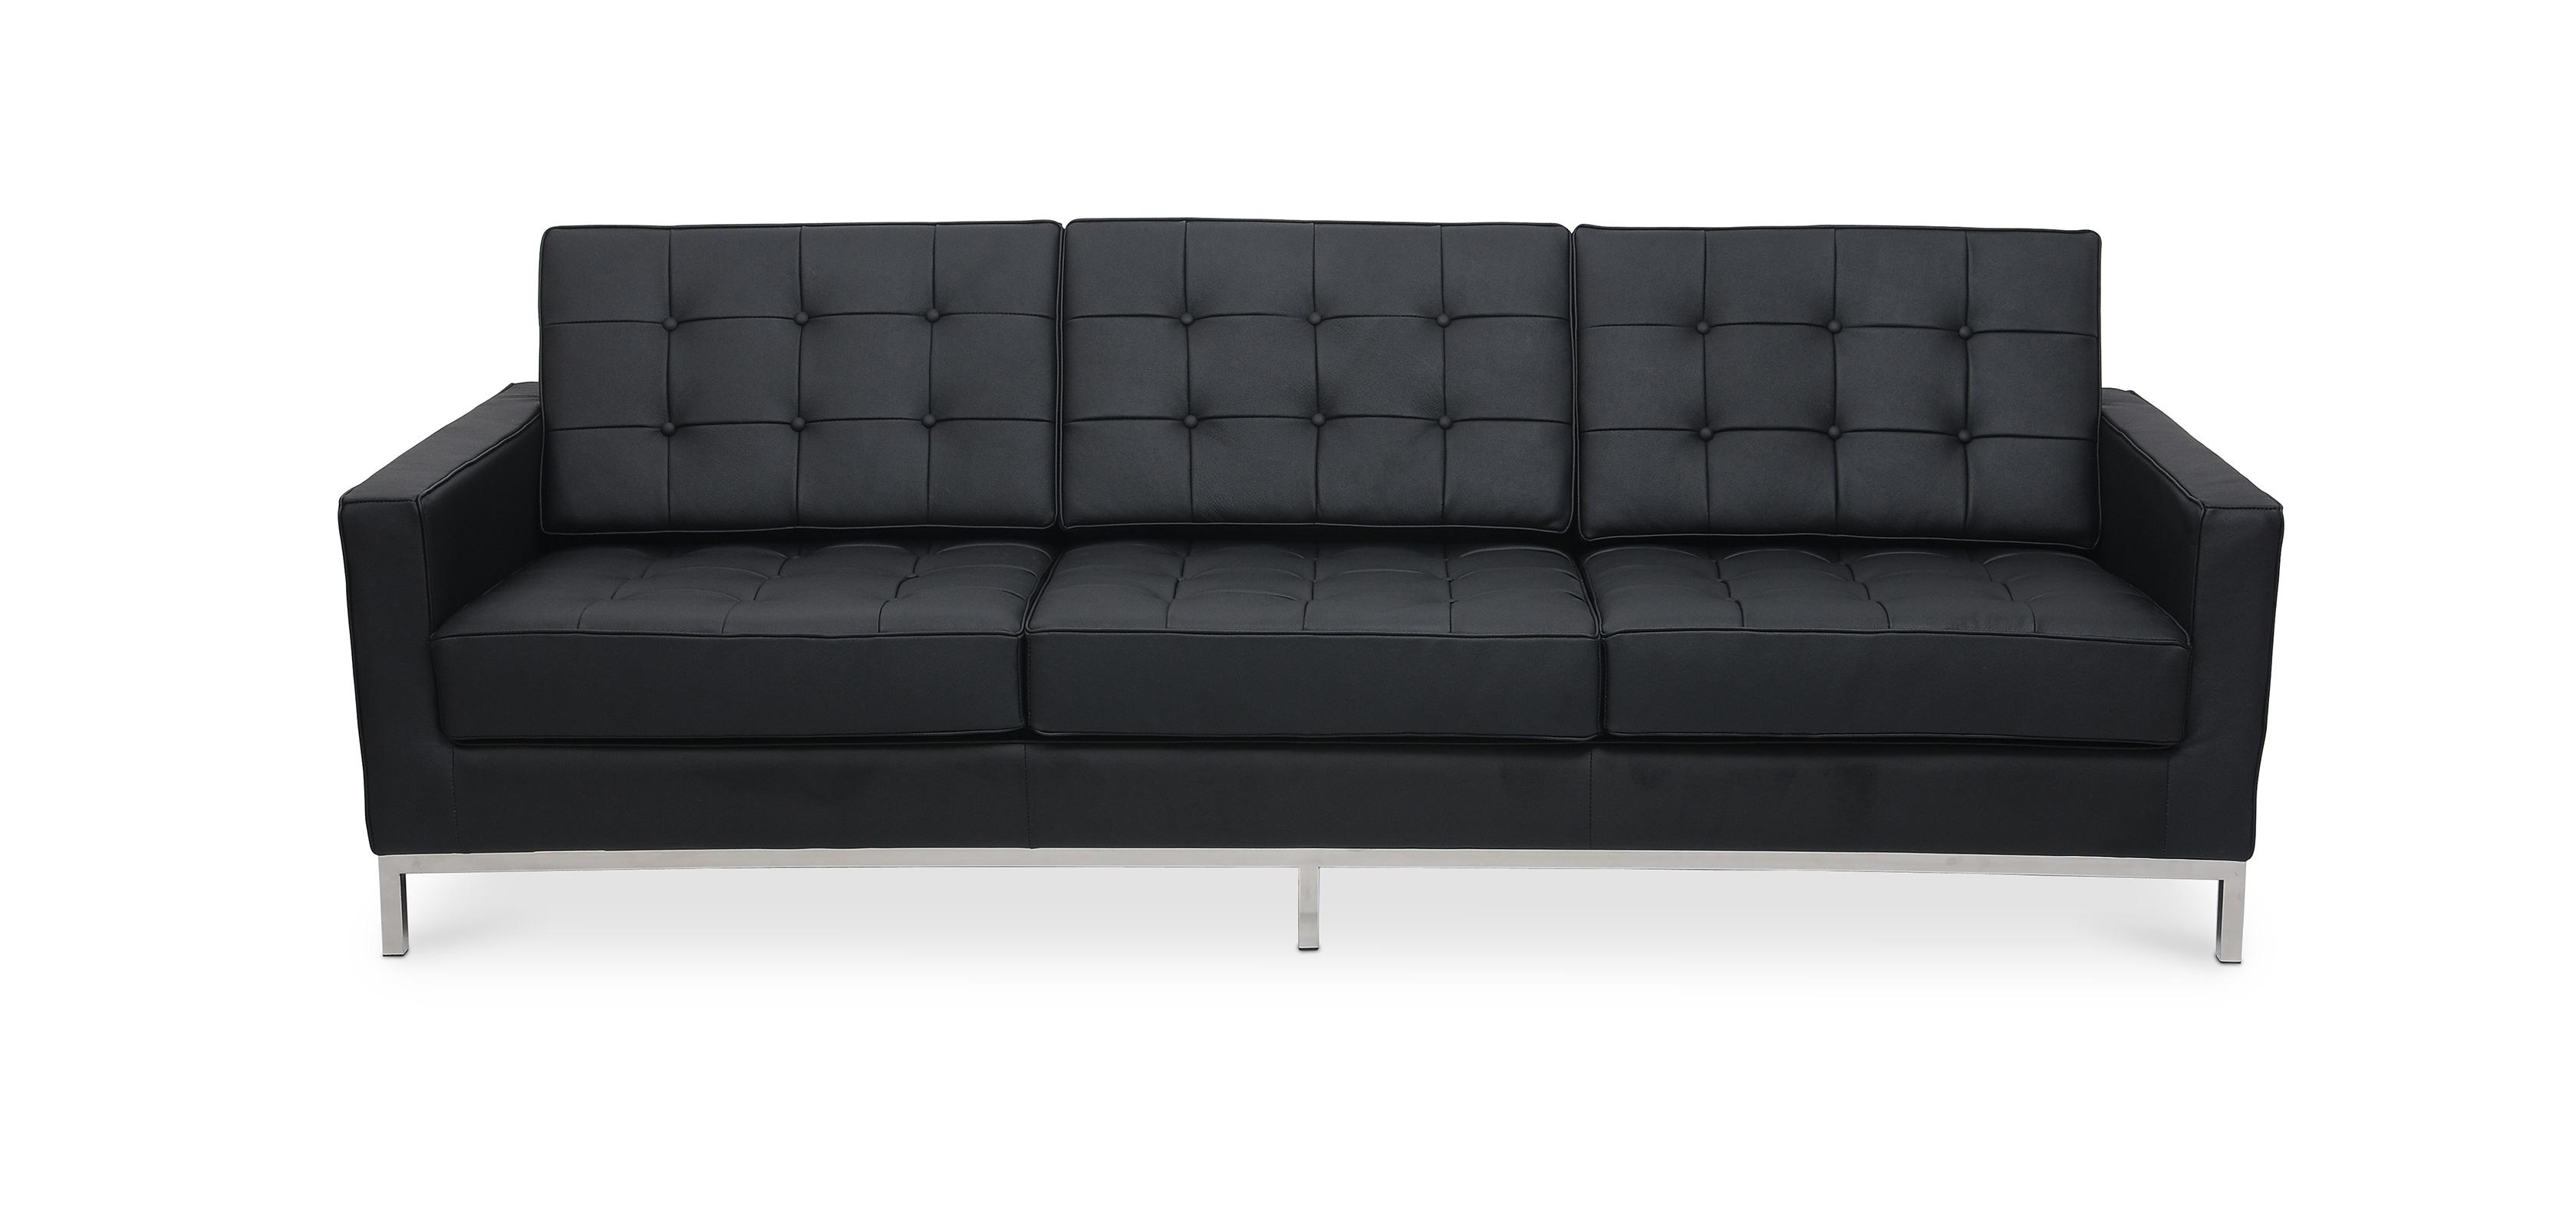 divano florence knoll 3 posti pelle. Black Bedroom Furniture Sets. Home Design Ideas